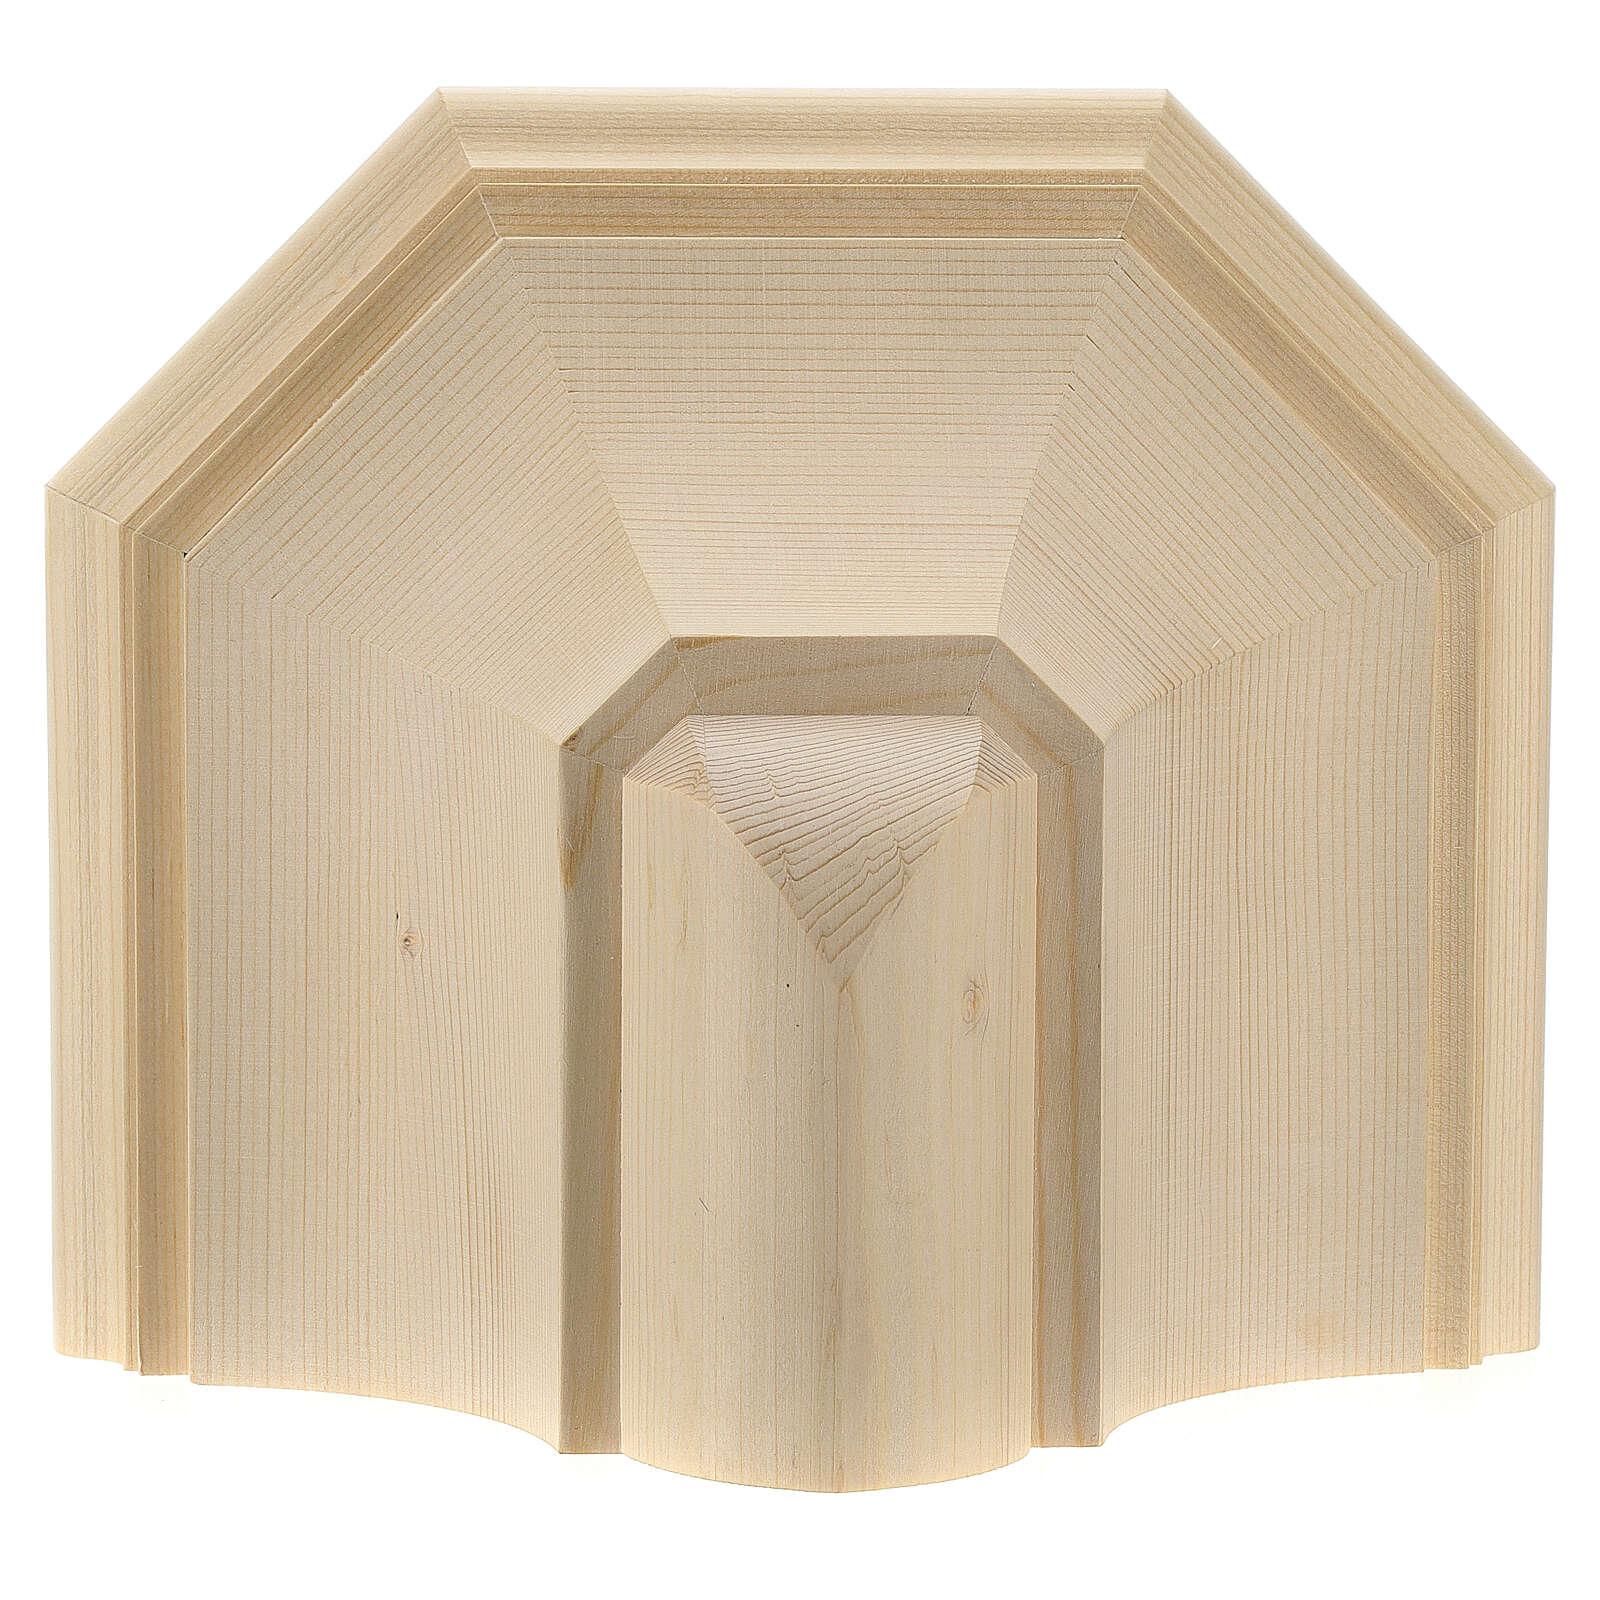 Wall shelf, gothic 22x27 in natural wax Valgardena wood 4